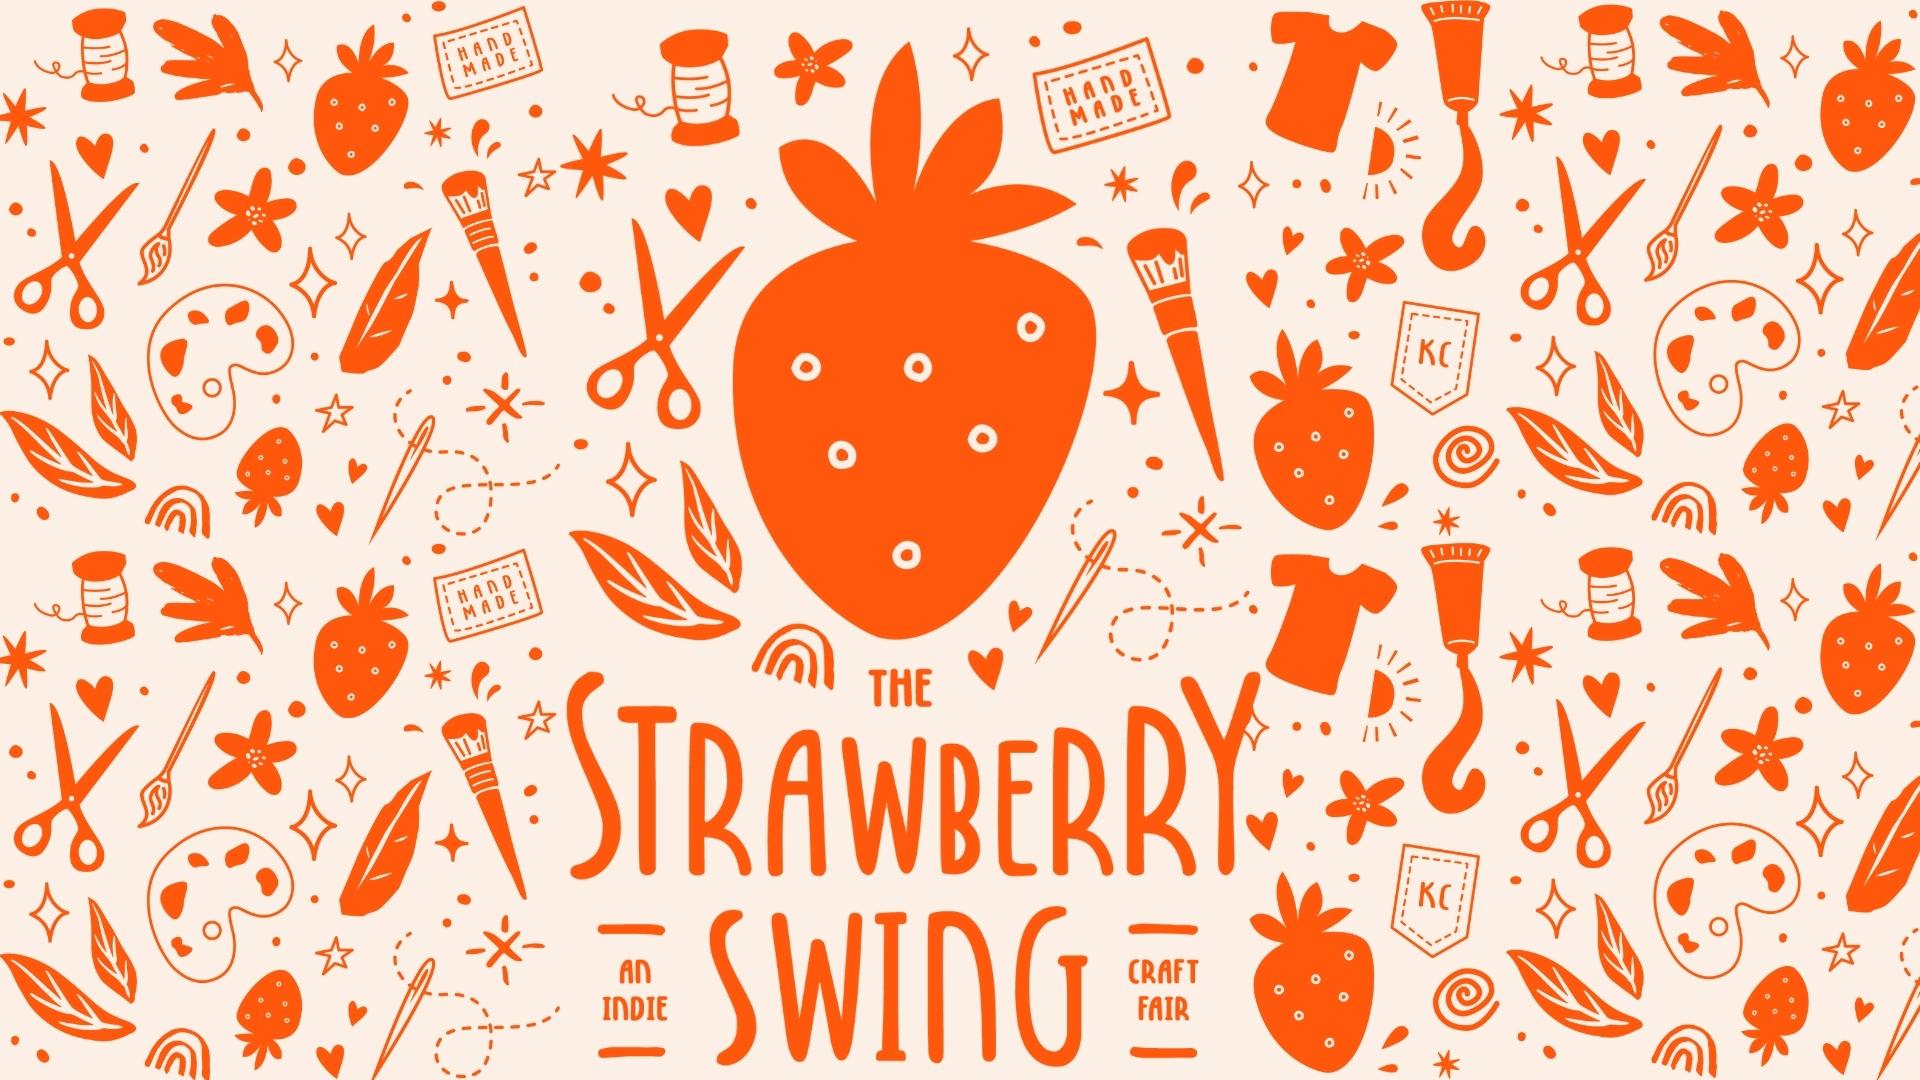 Logo of Strawberry Swing Indie Craft Fair